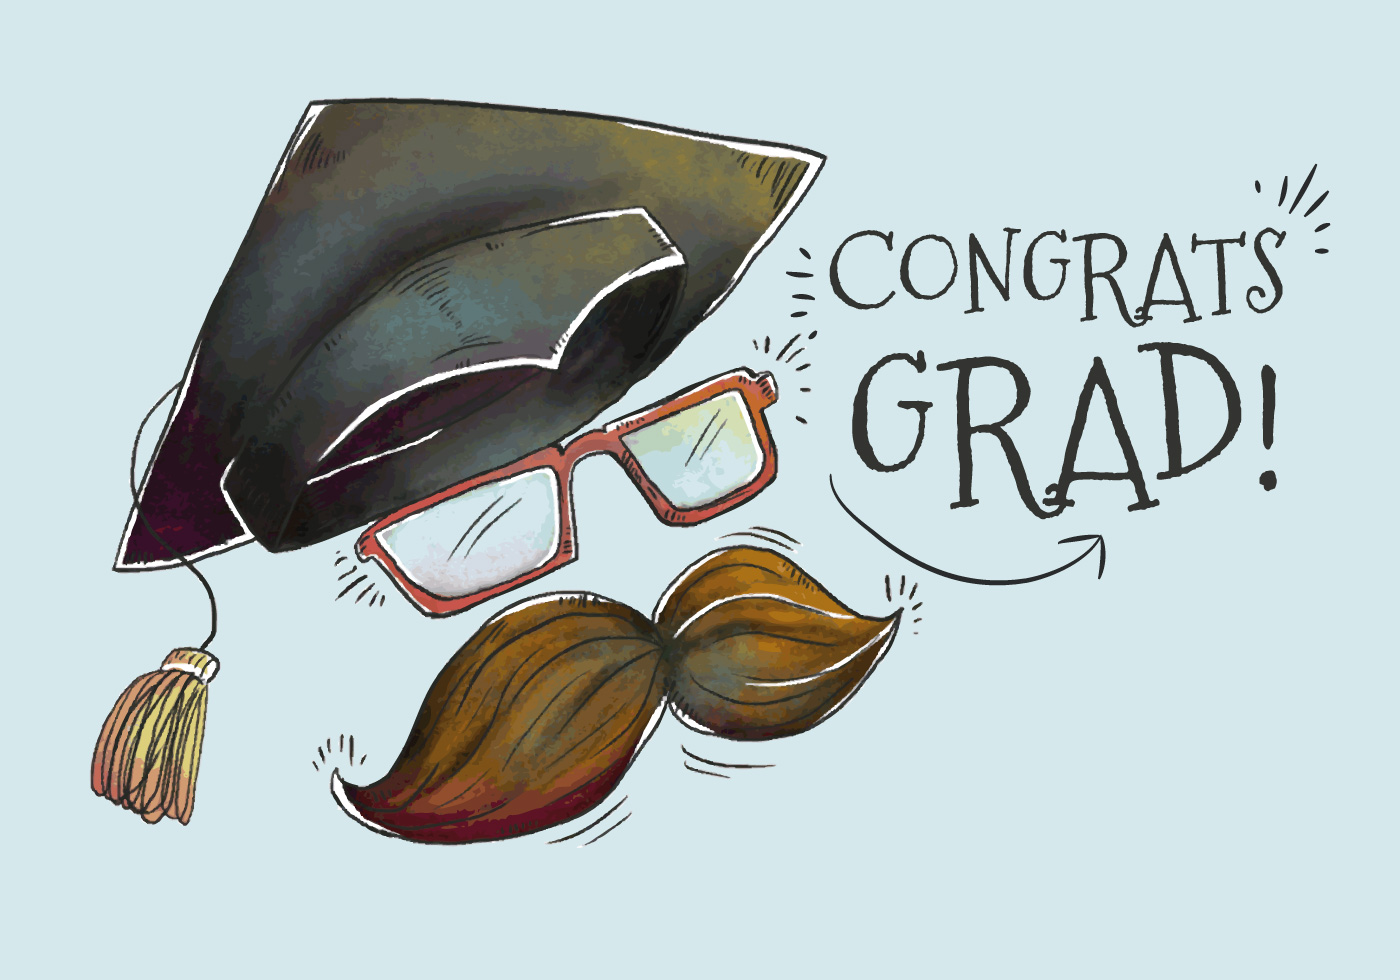 Cute Grad Hat With Mustache for Graduation Season Vector ...